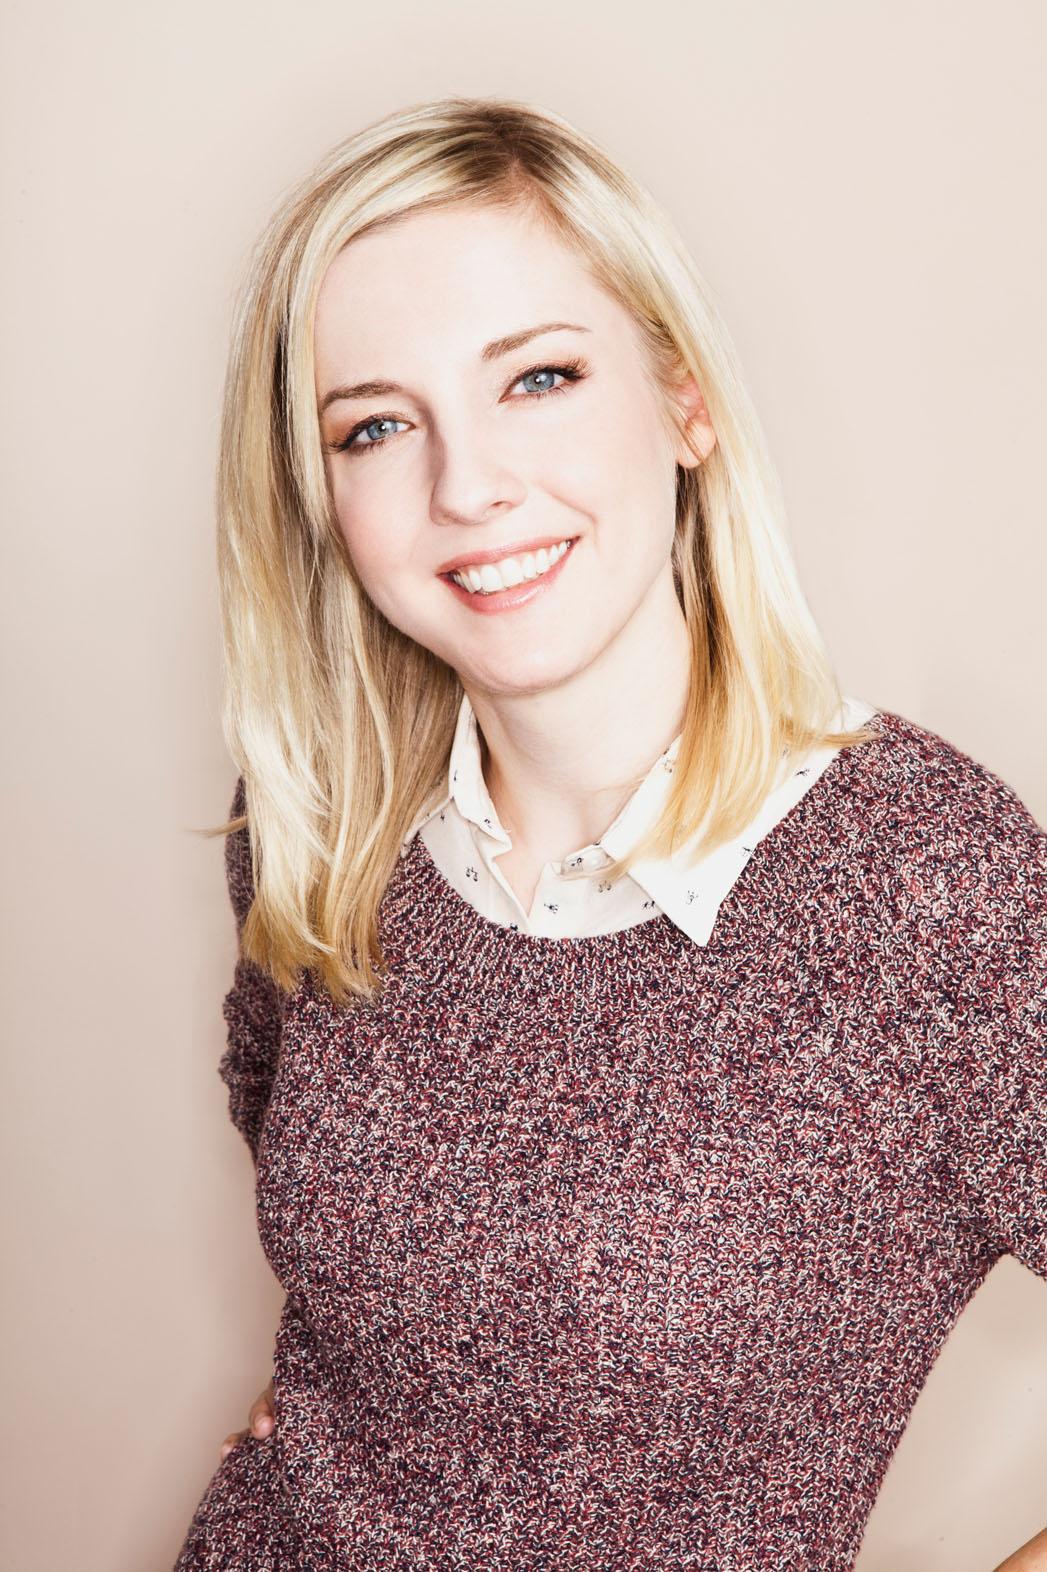 Katie Dippold Headshot - P 2014